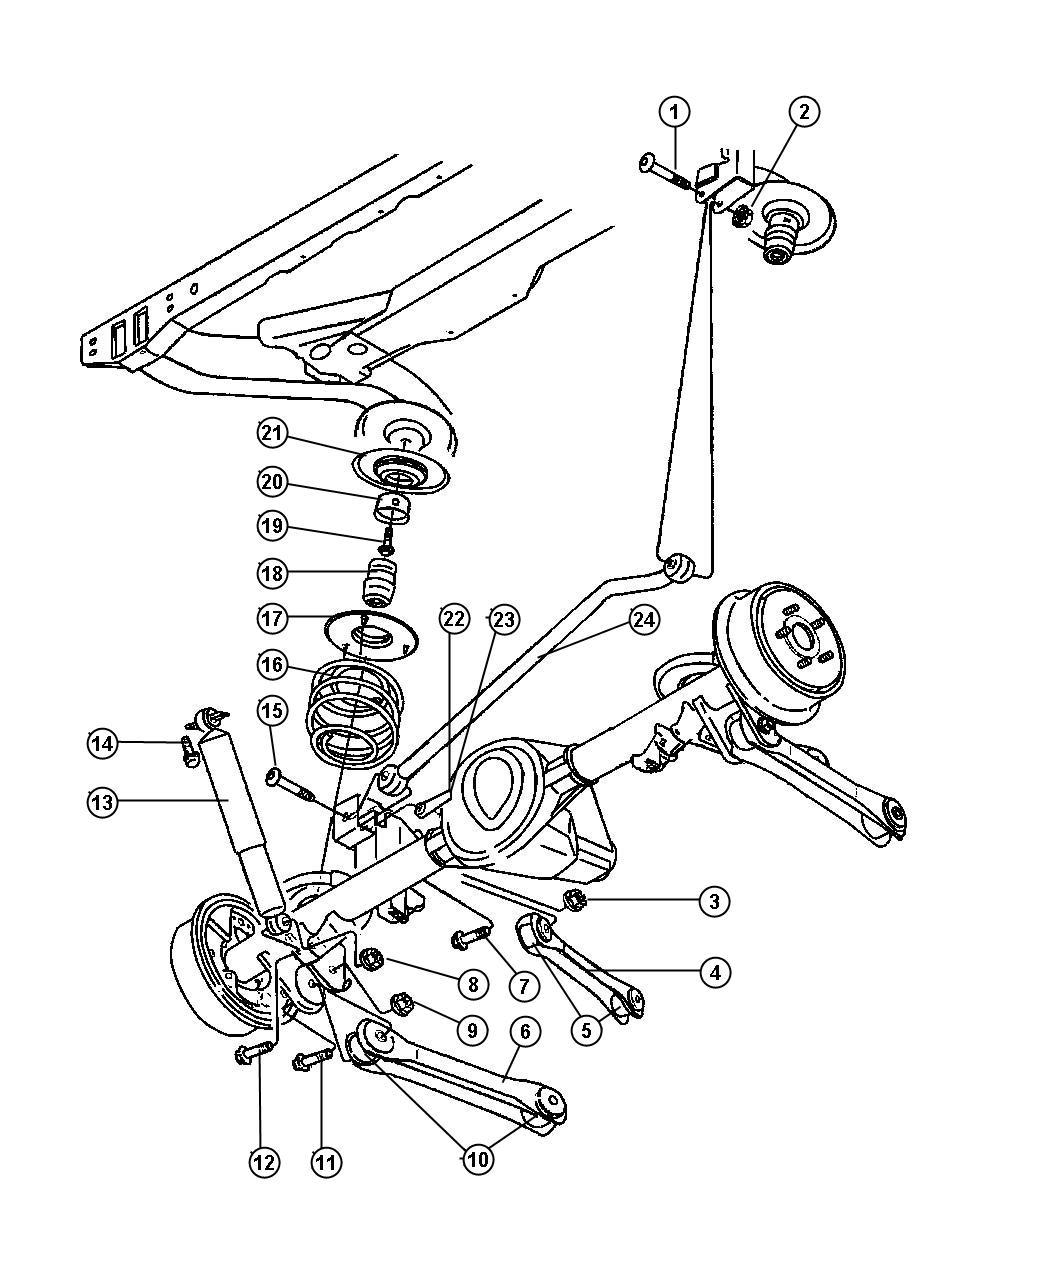 chrysler 4.0 timing belt replacement